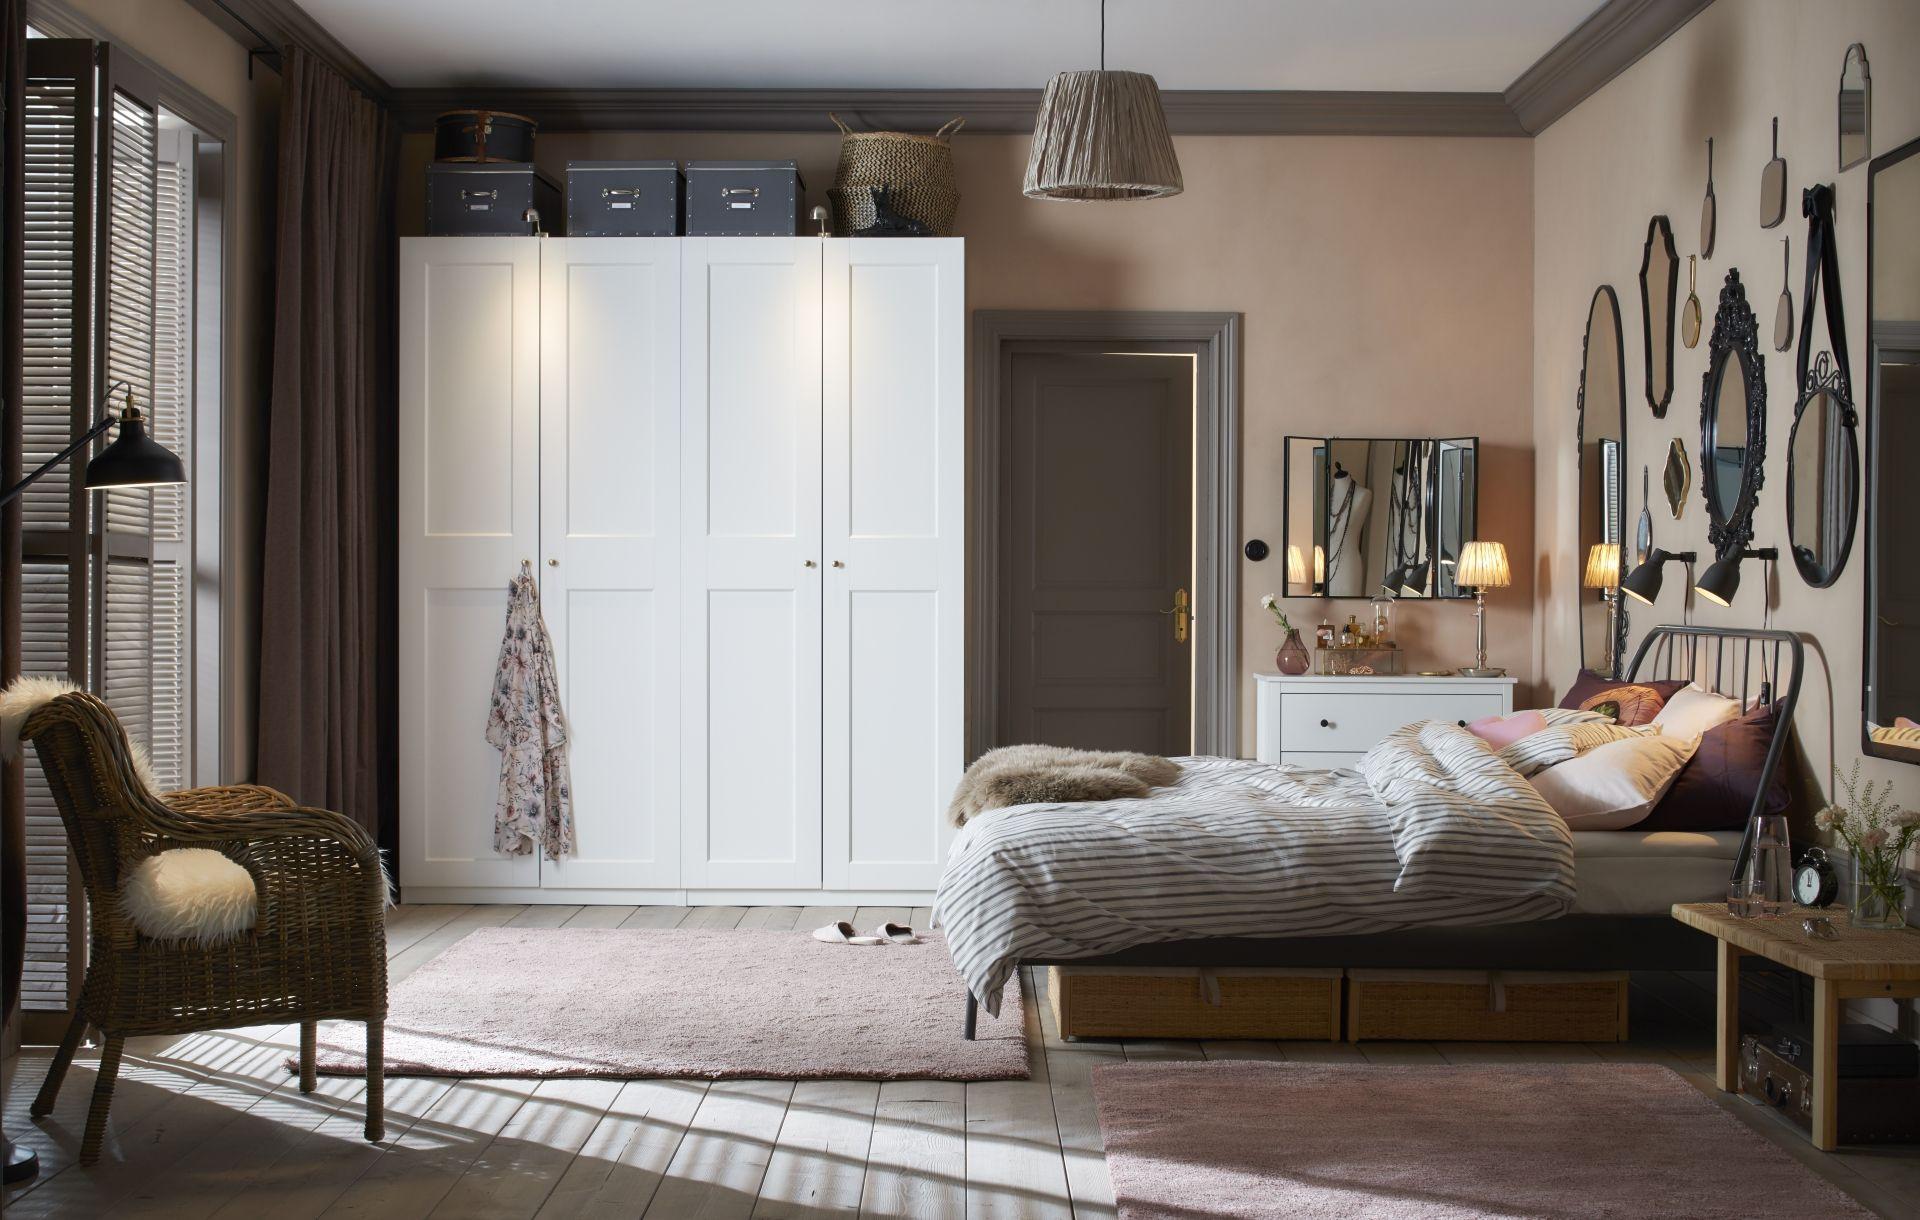 KOPARDAL bedframe | IKEA IKEAnl IKEAnederland bed slaapkamer kamer ...